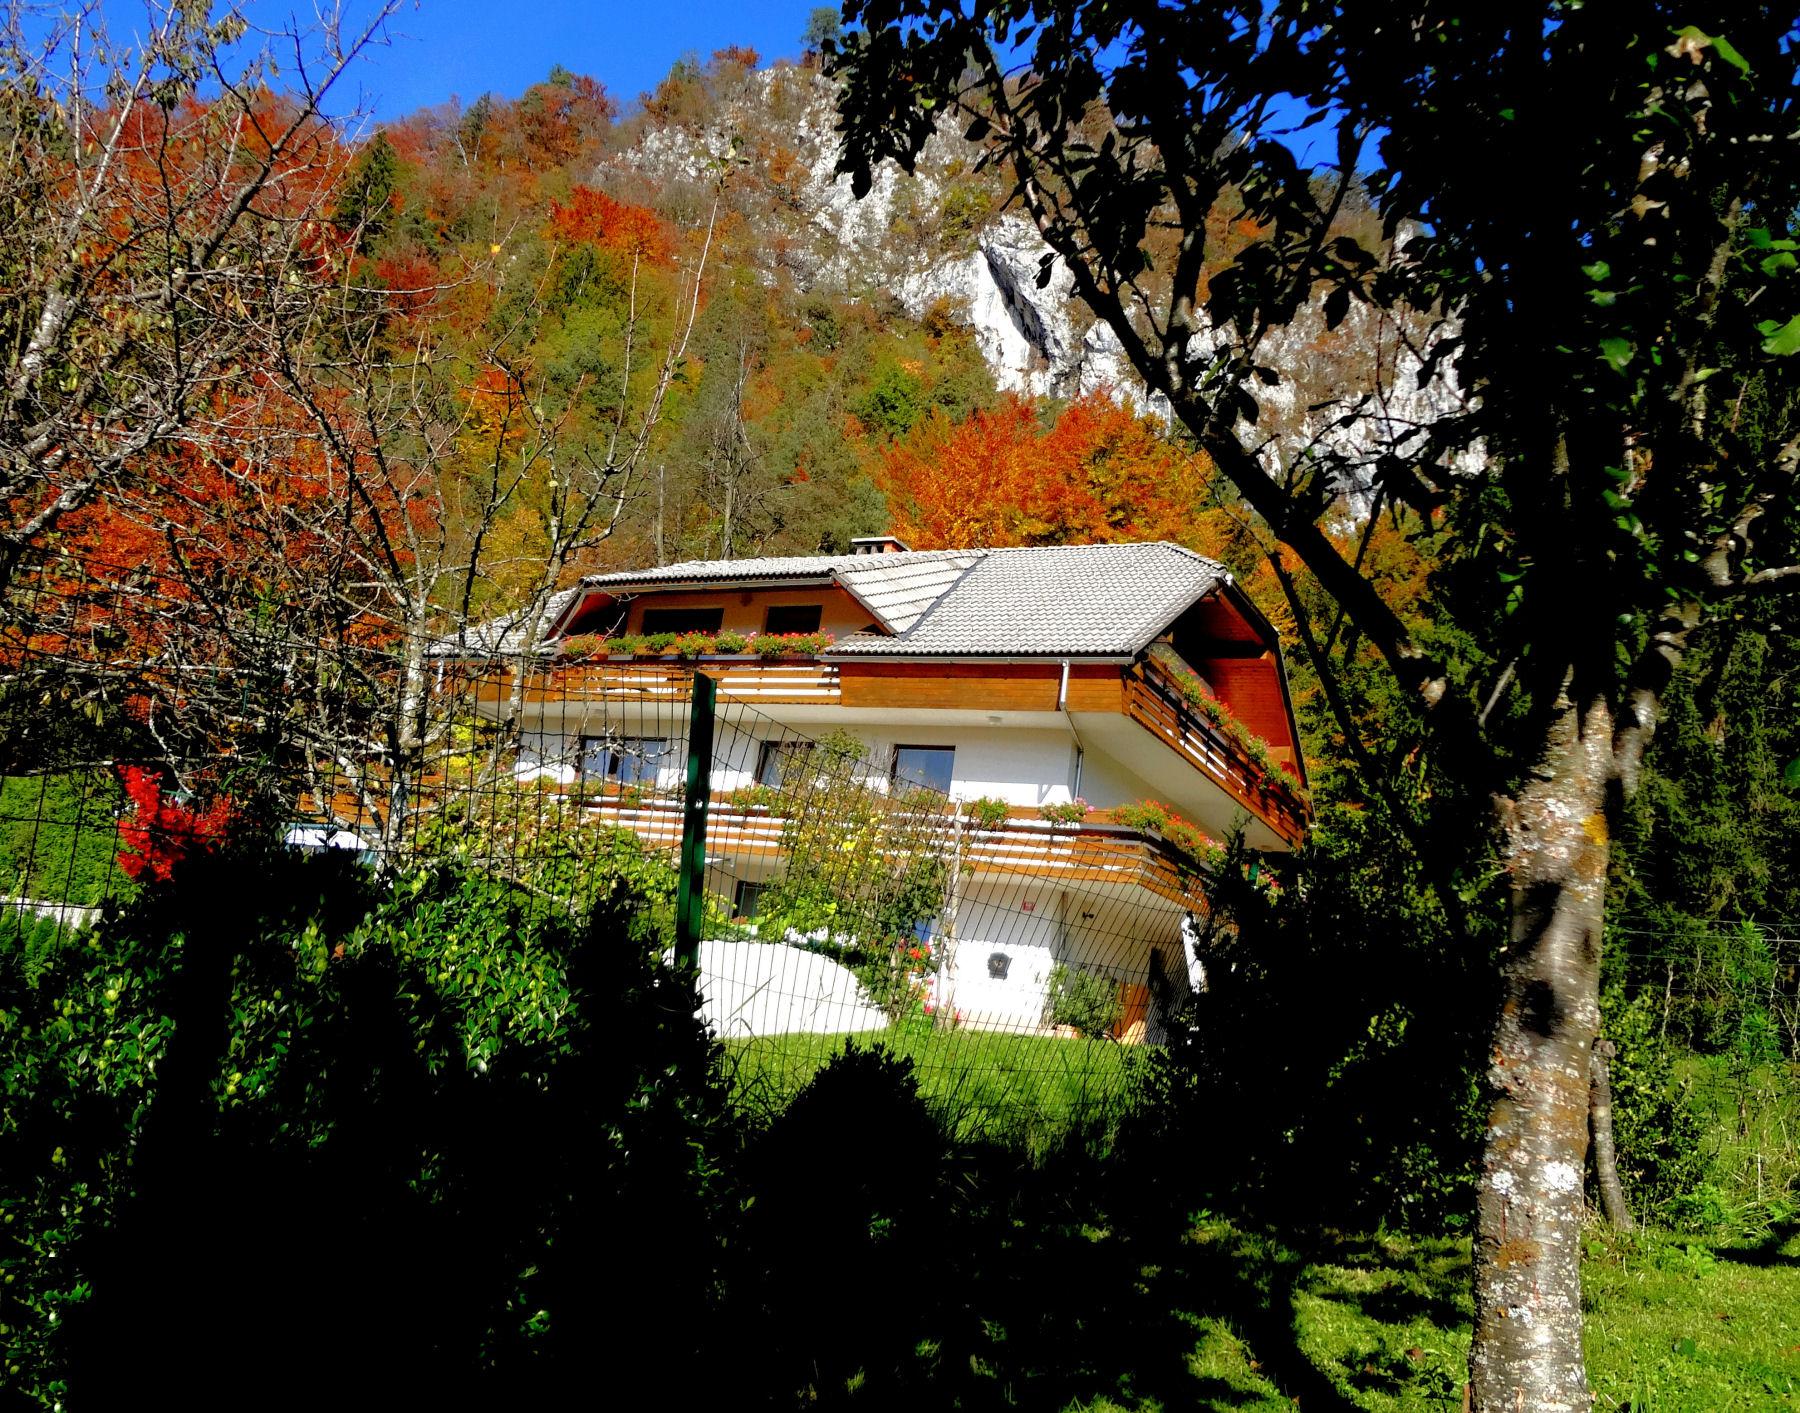 autumn-nature-slovenia-011